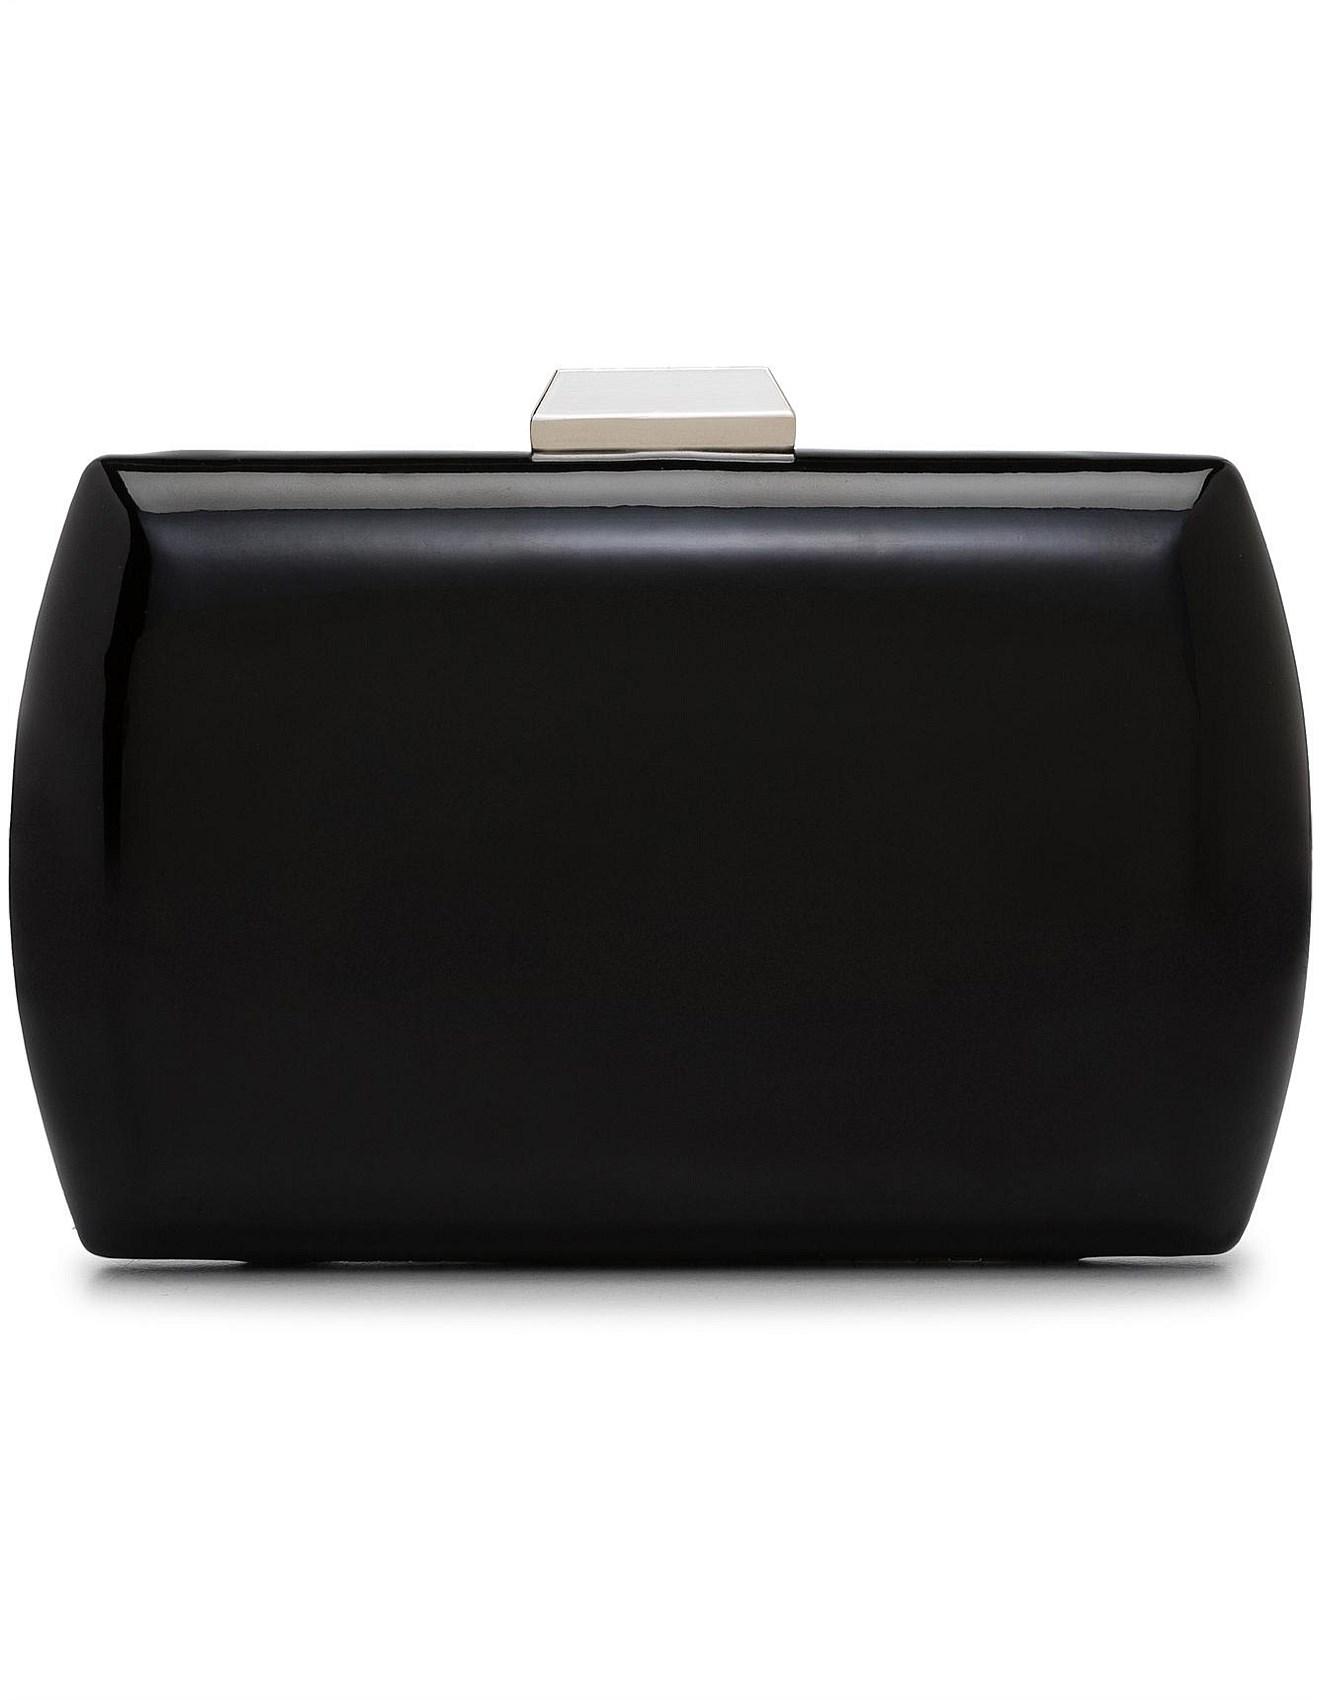 215a9a18d5 Women's Clutches & Pouches | Buy Bags Online | David Jones ...